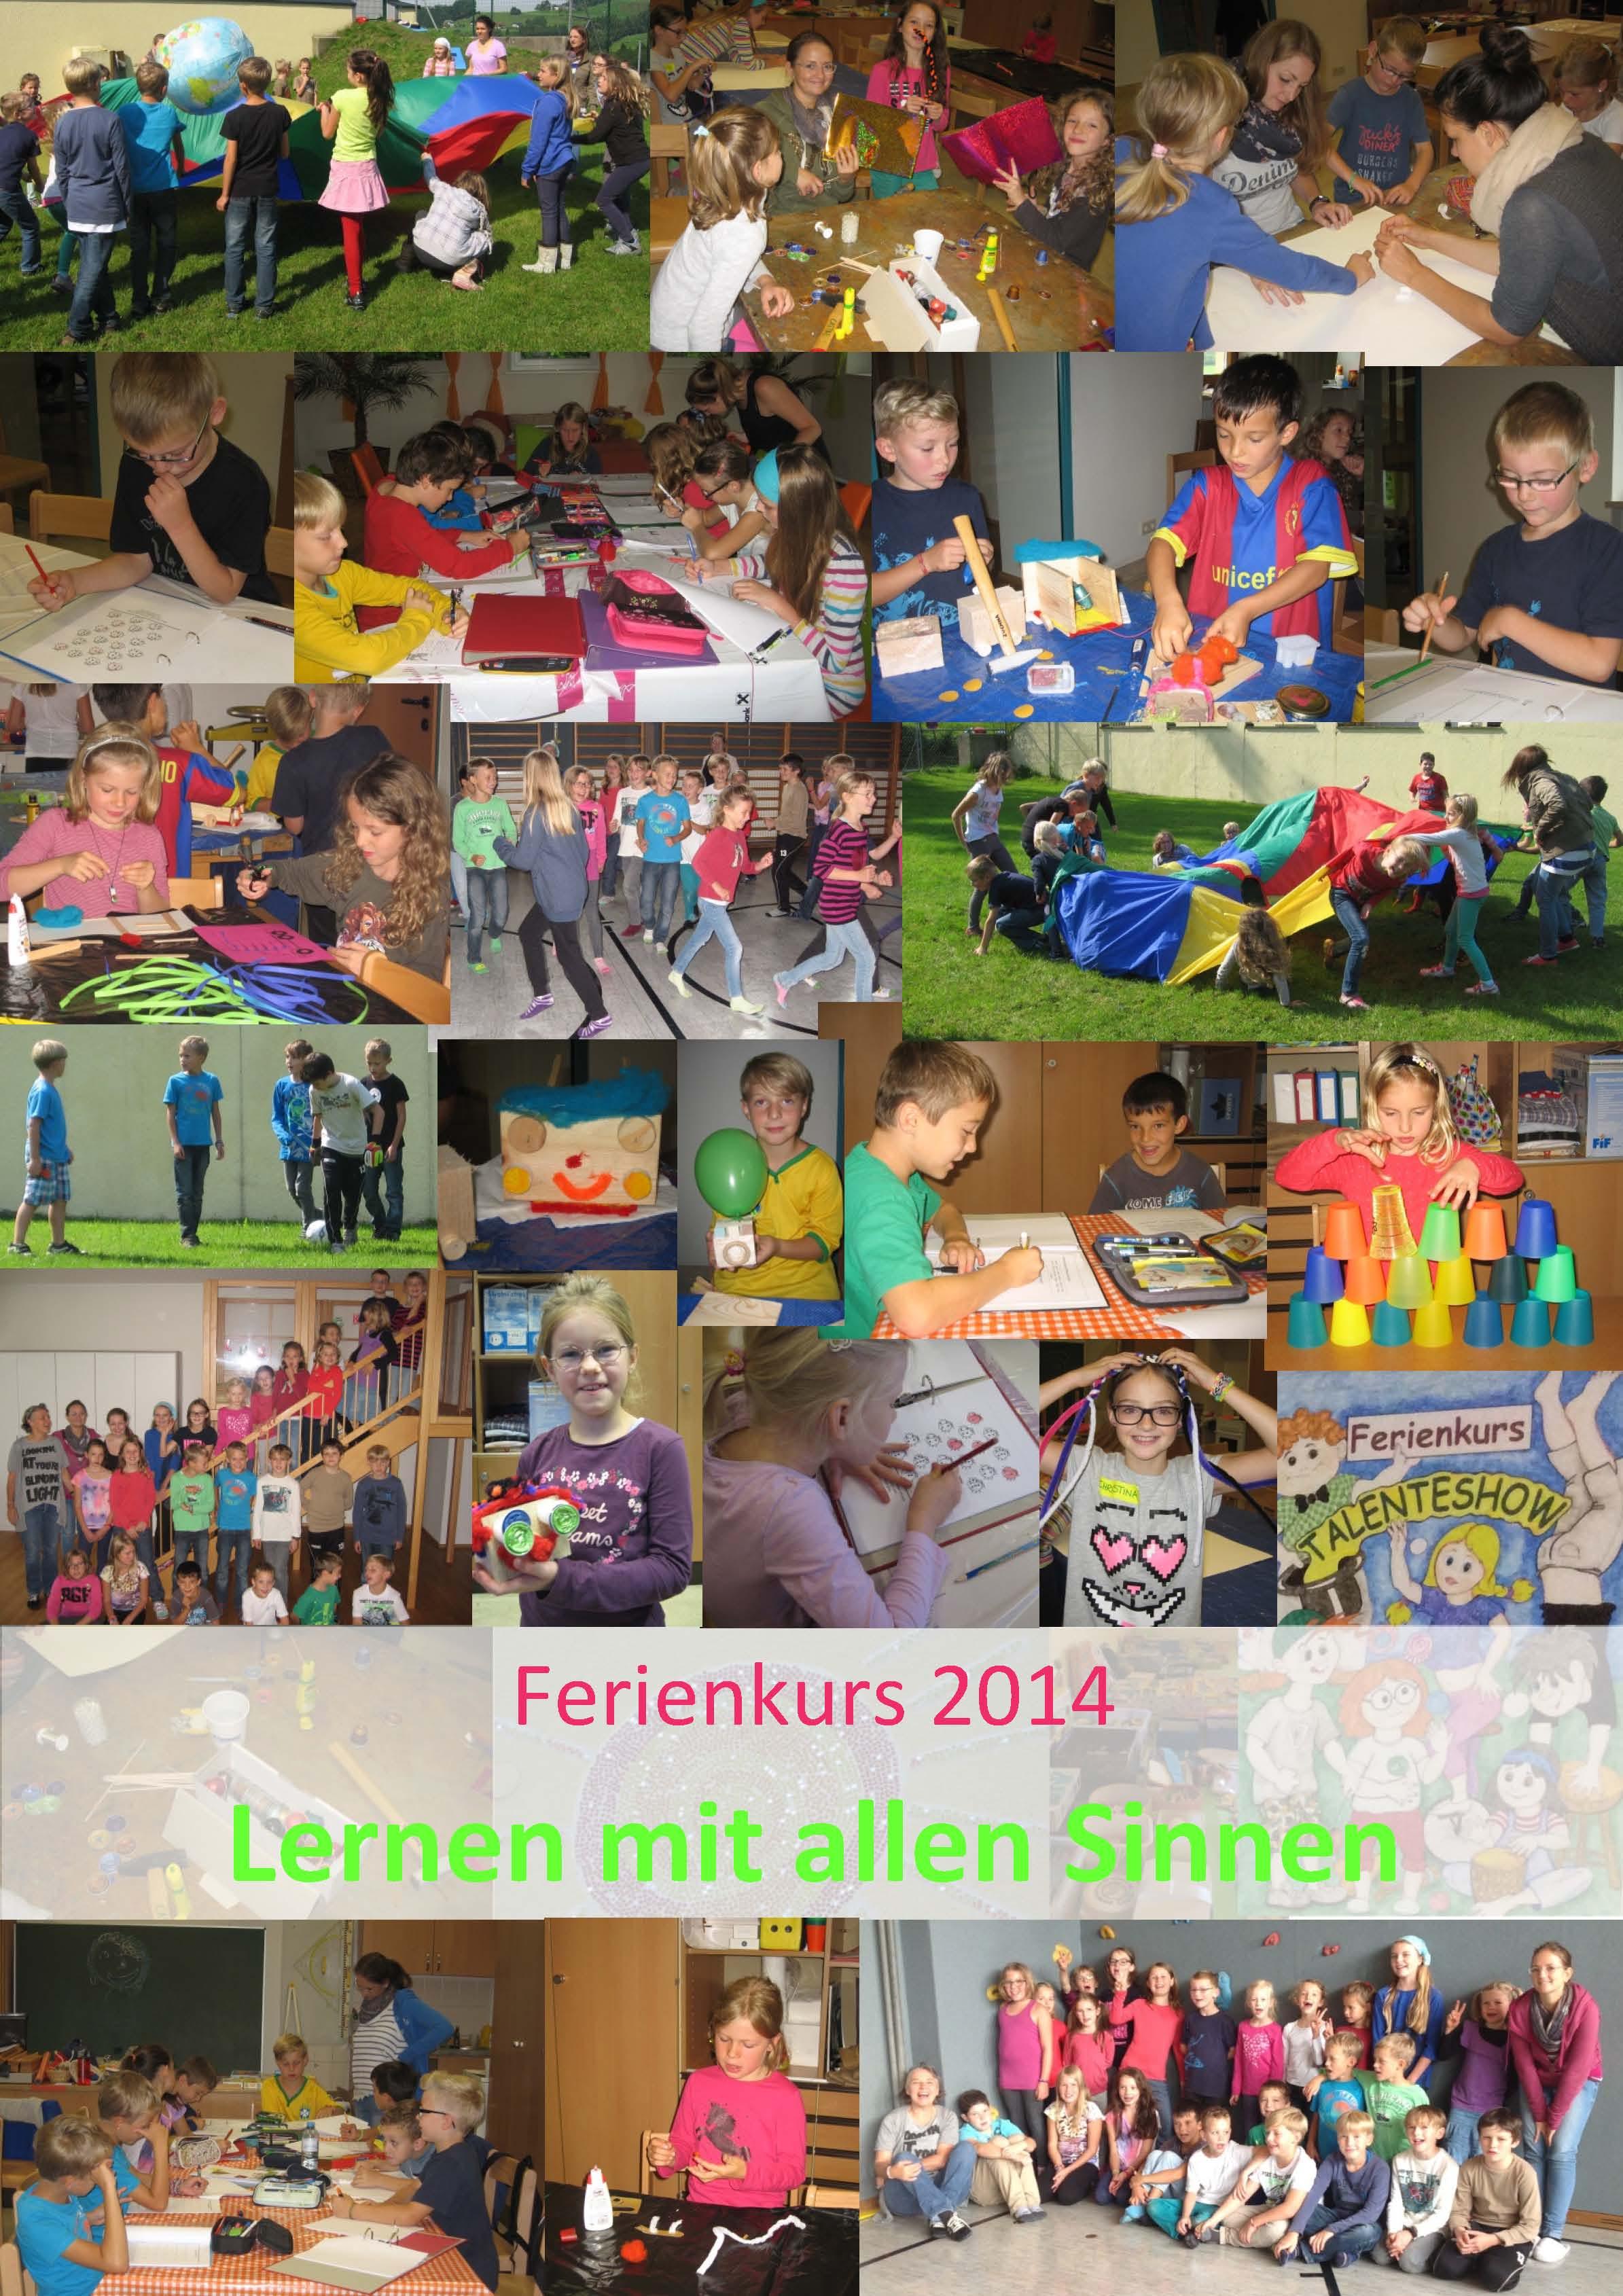 collage_ferienkurs_2014_guggenthal